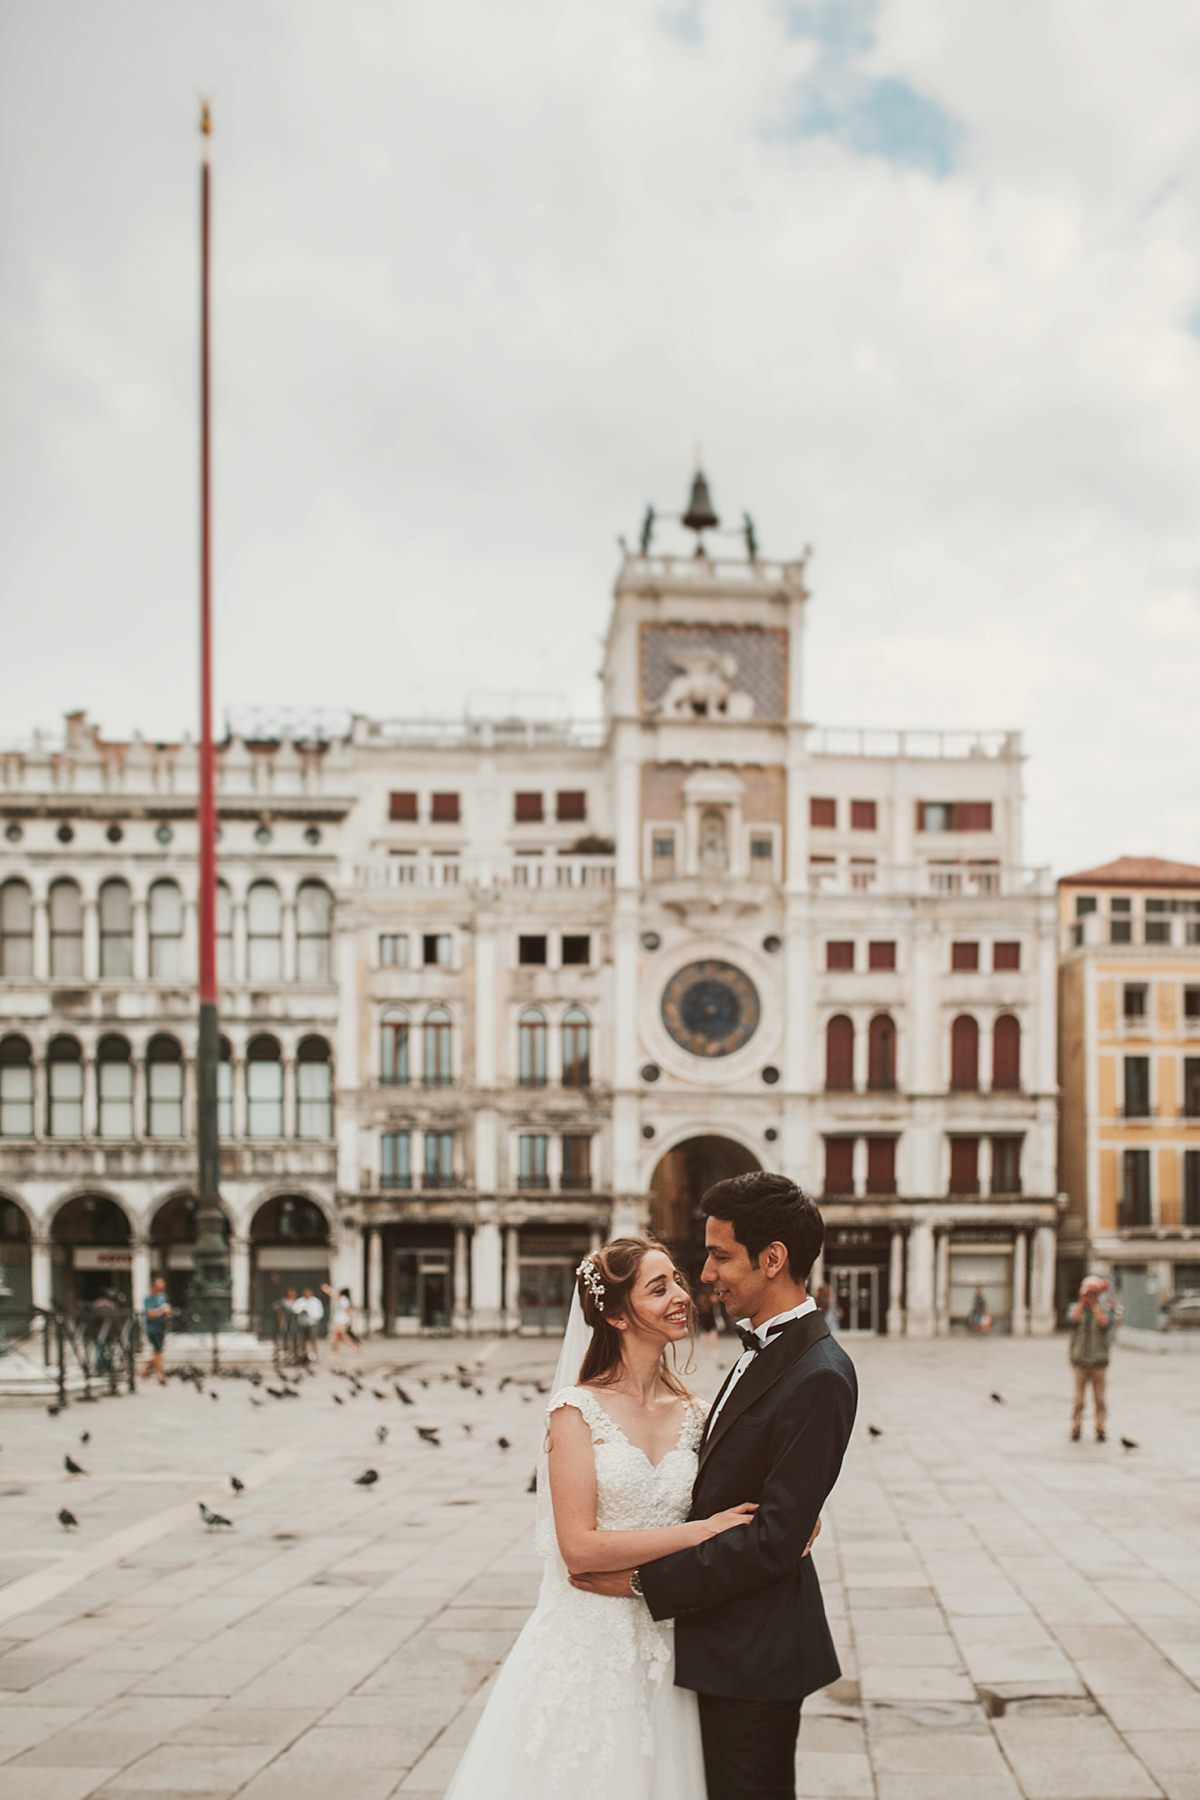 romantica-luna-di-miele-a-venezia_0035